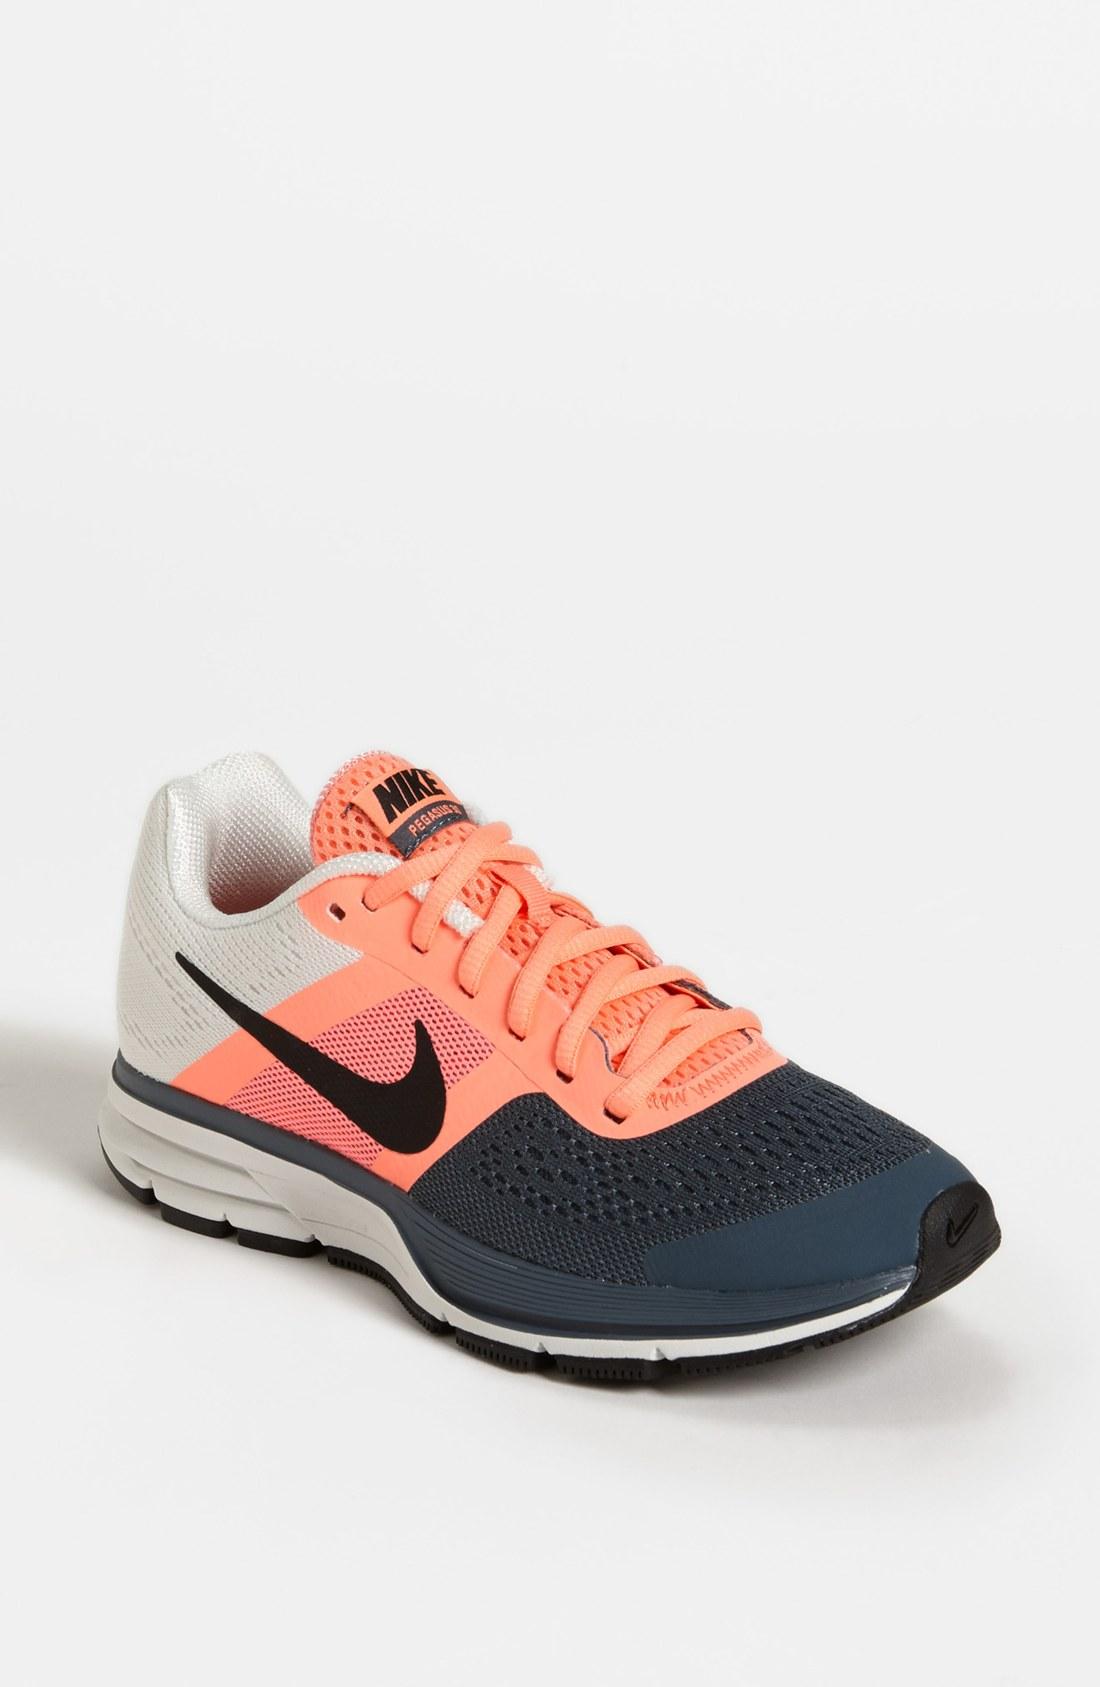 Nike Womens Shoes Pink Grey